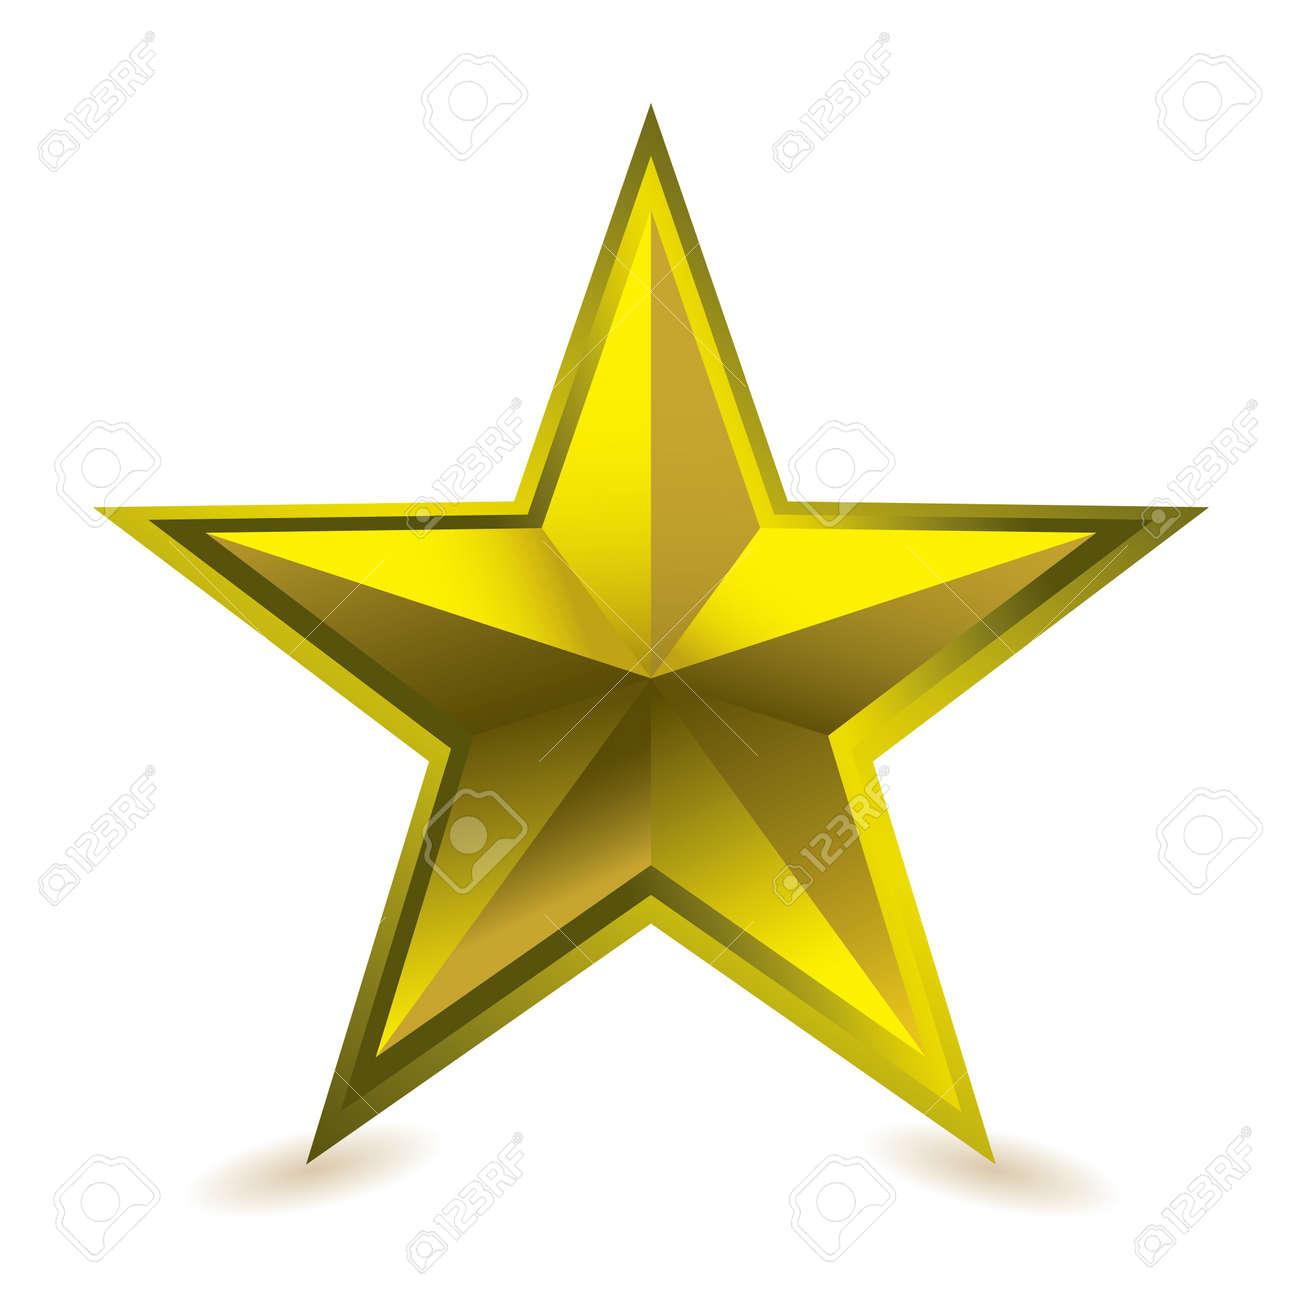 gold star award ideal gift icon for golden performance stock photo rh 123rf com